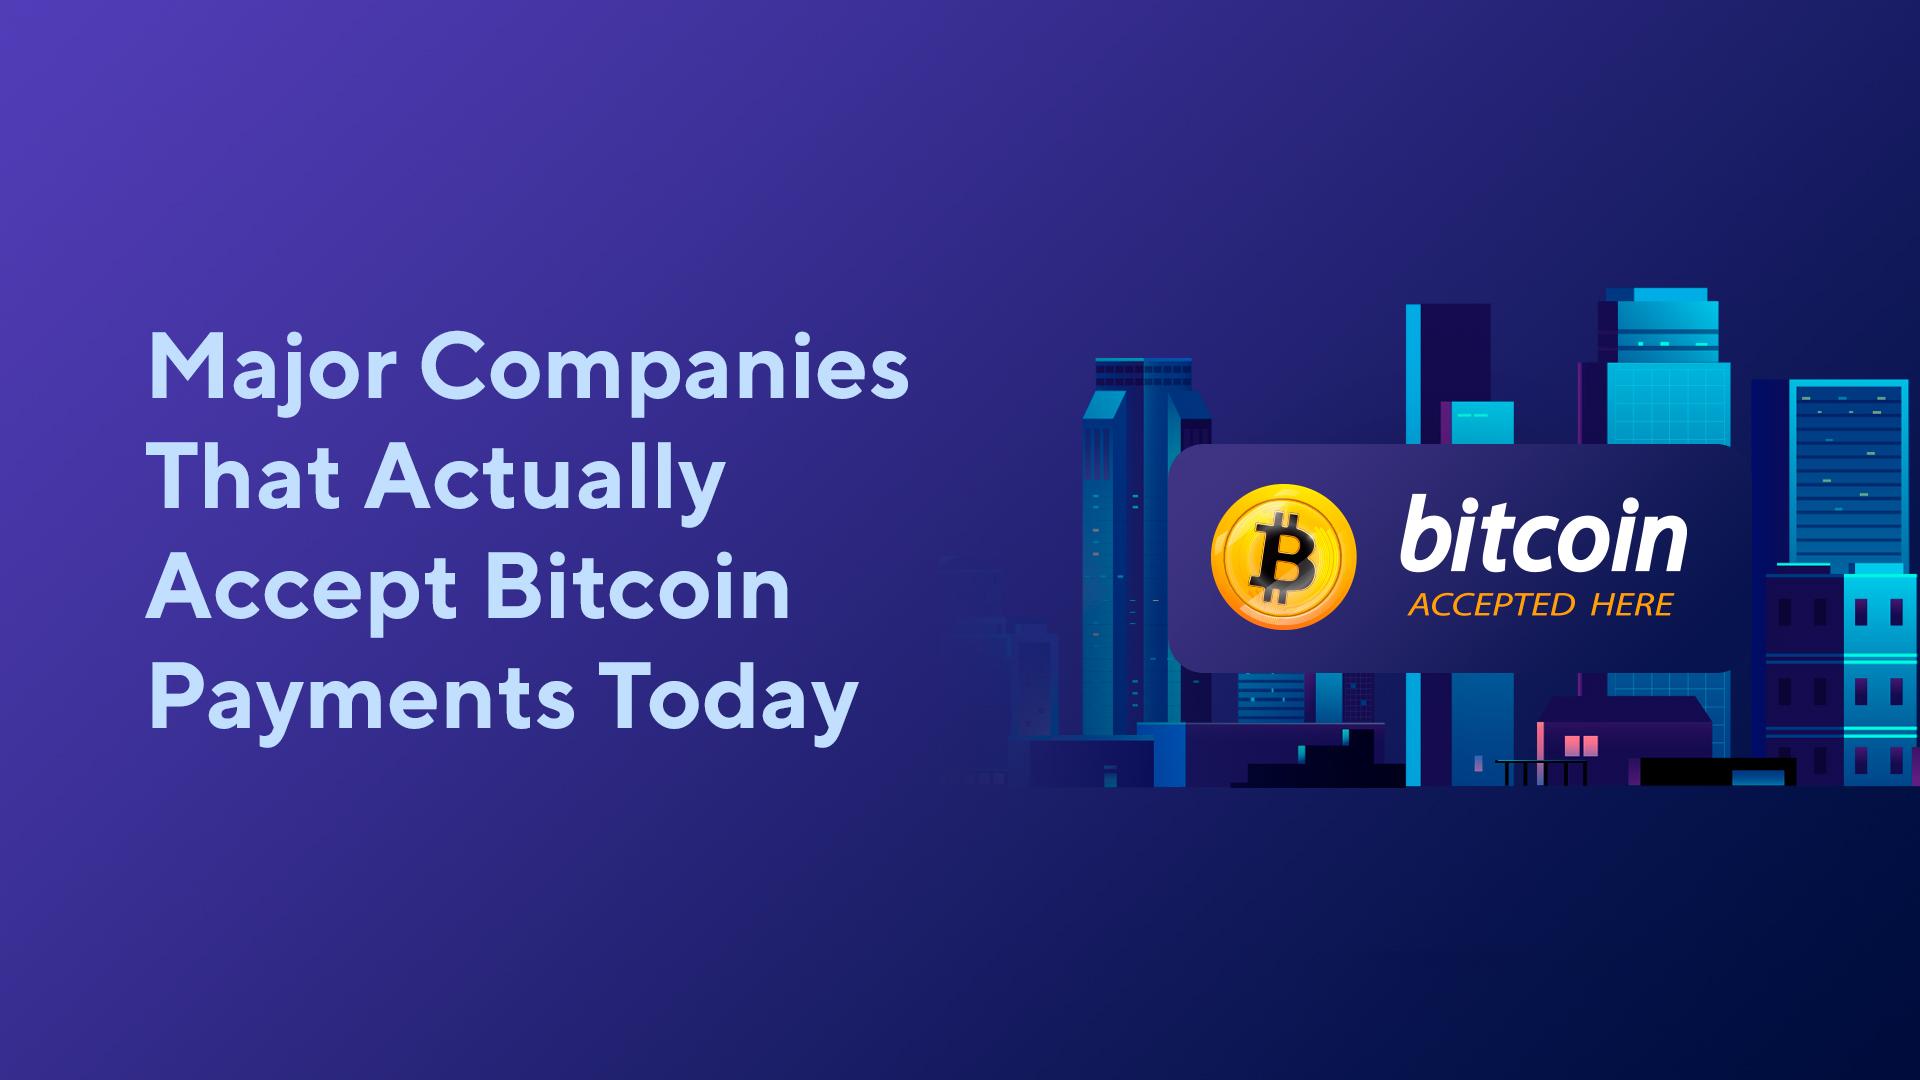 Major Companies That Actually Accept Bitcoin Payments Today